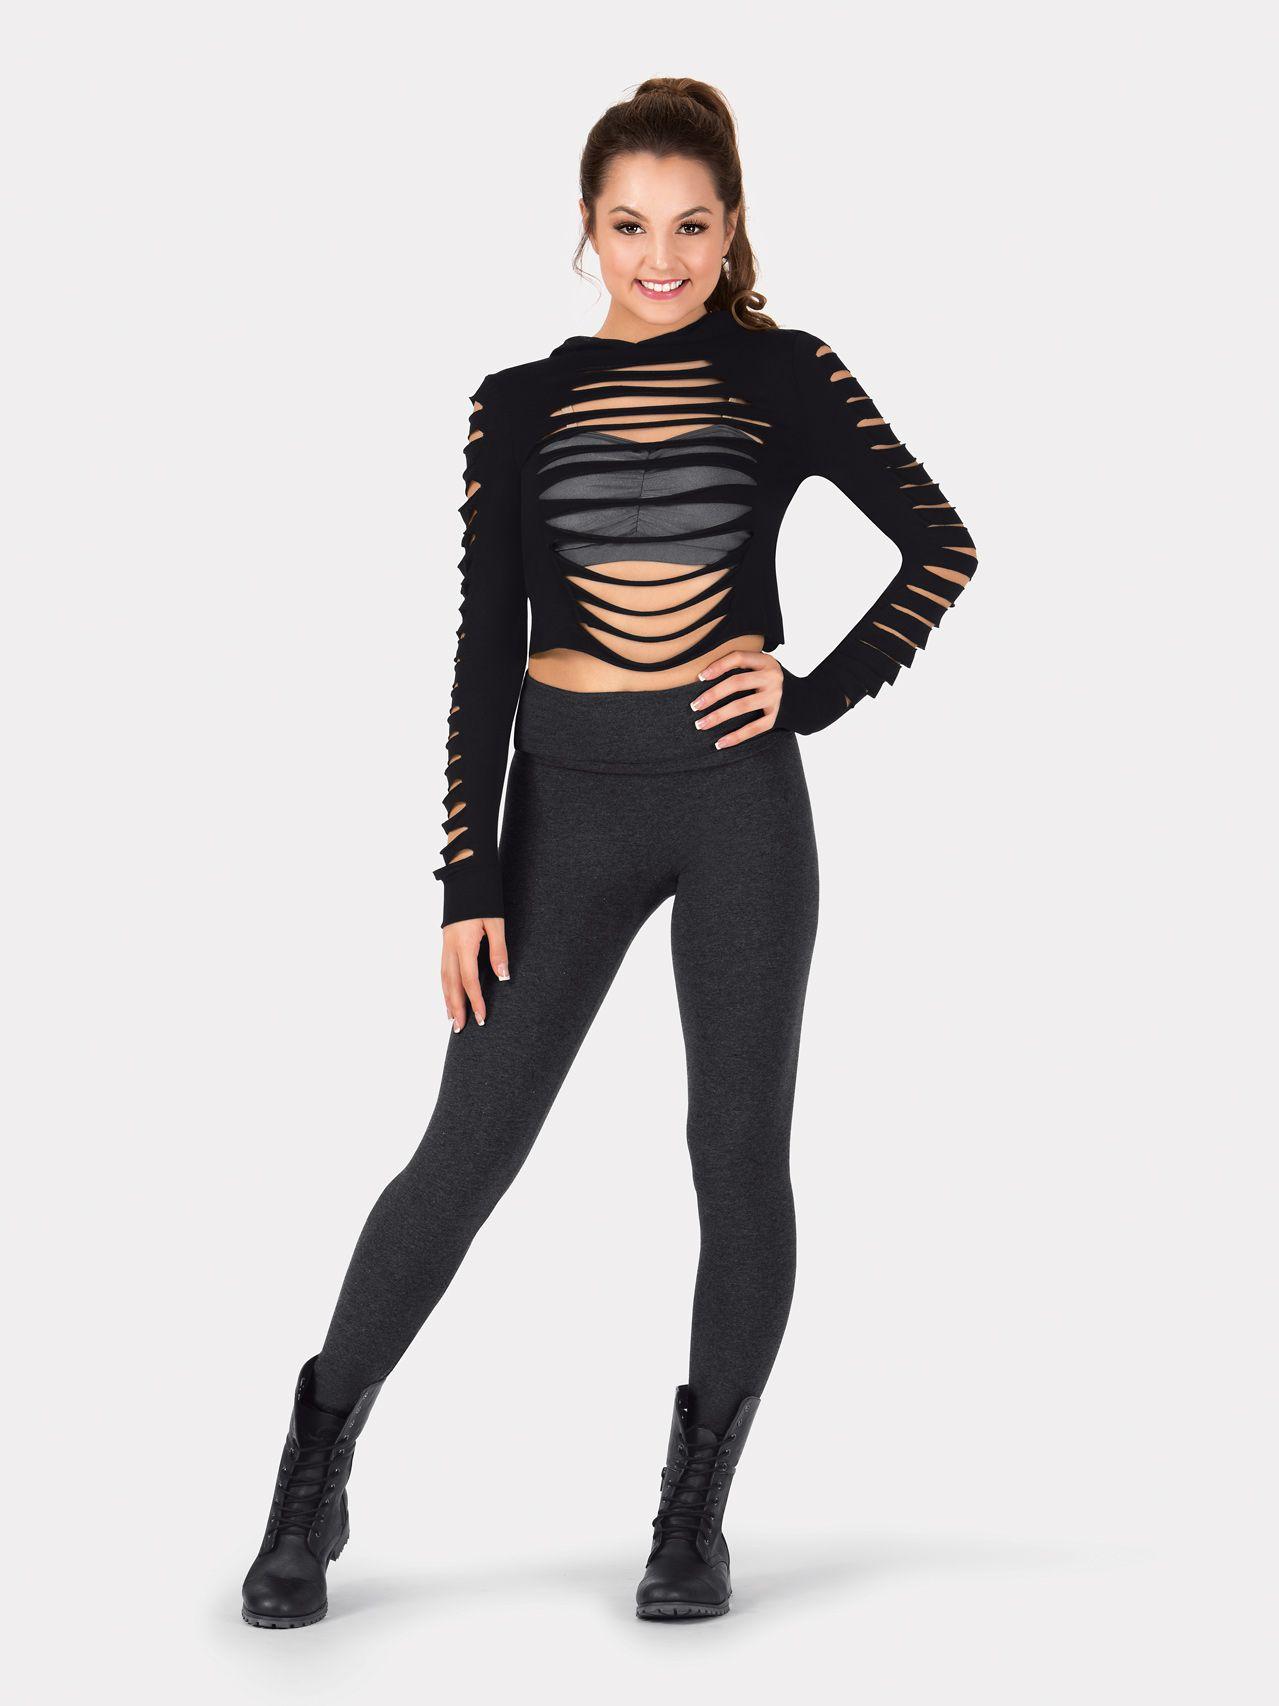 Costumes Adult Sleeve TopDance Tap Long Crop Shredded Y7yvfbg6